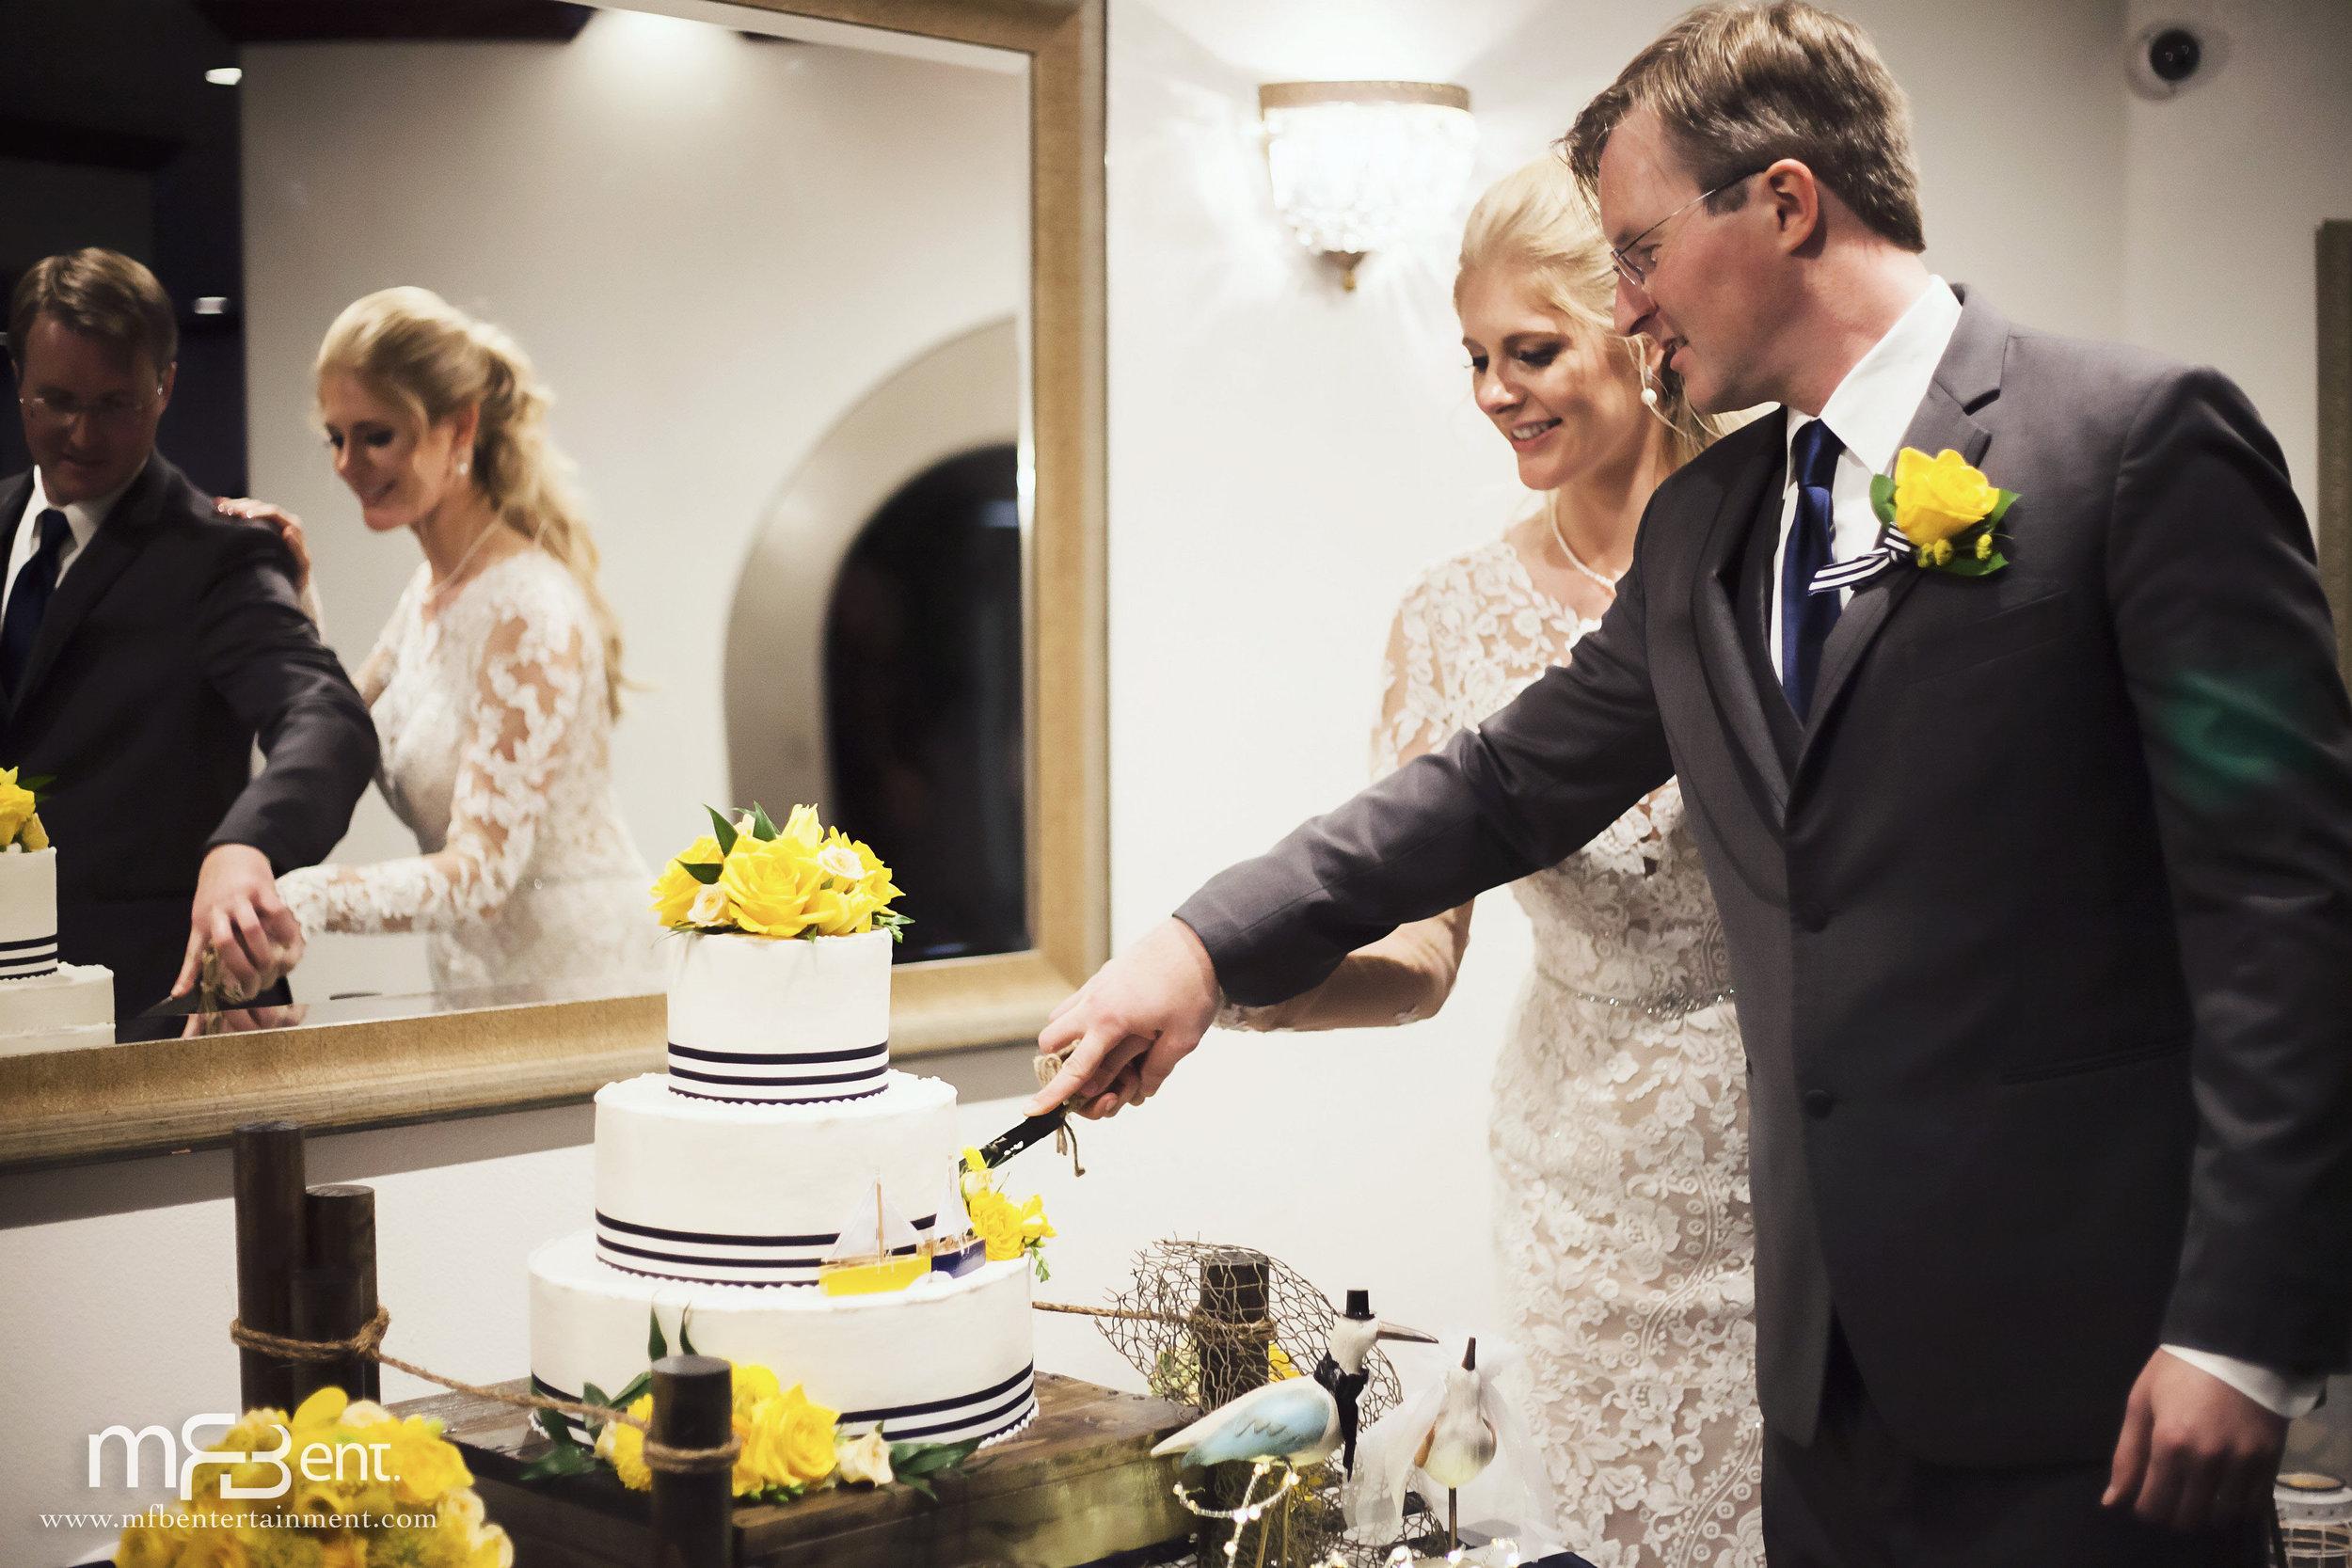 PIOTR CHELSEA WEDDING-RECEPTION-0173 L.jpg